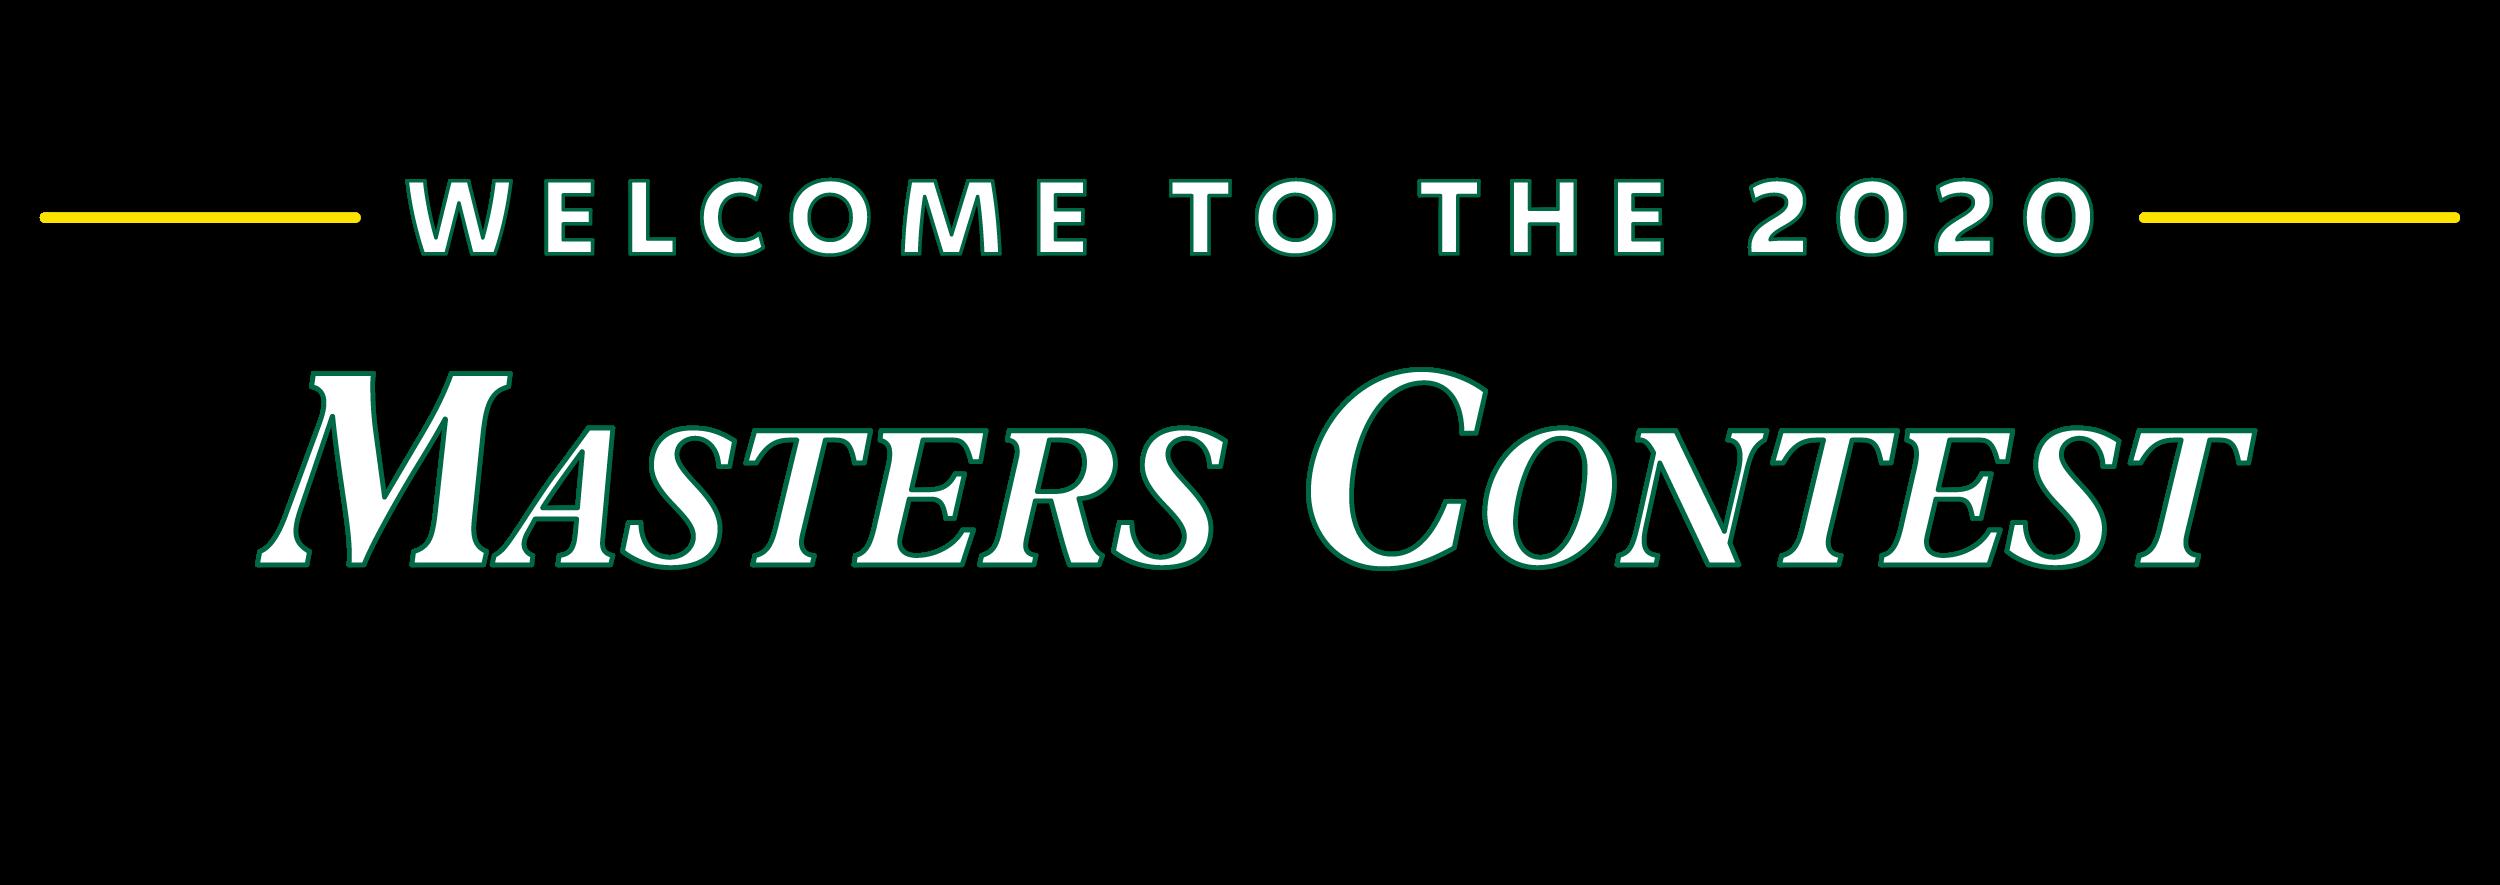 2020 Masters Contest